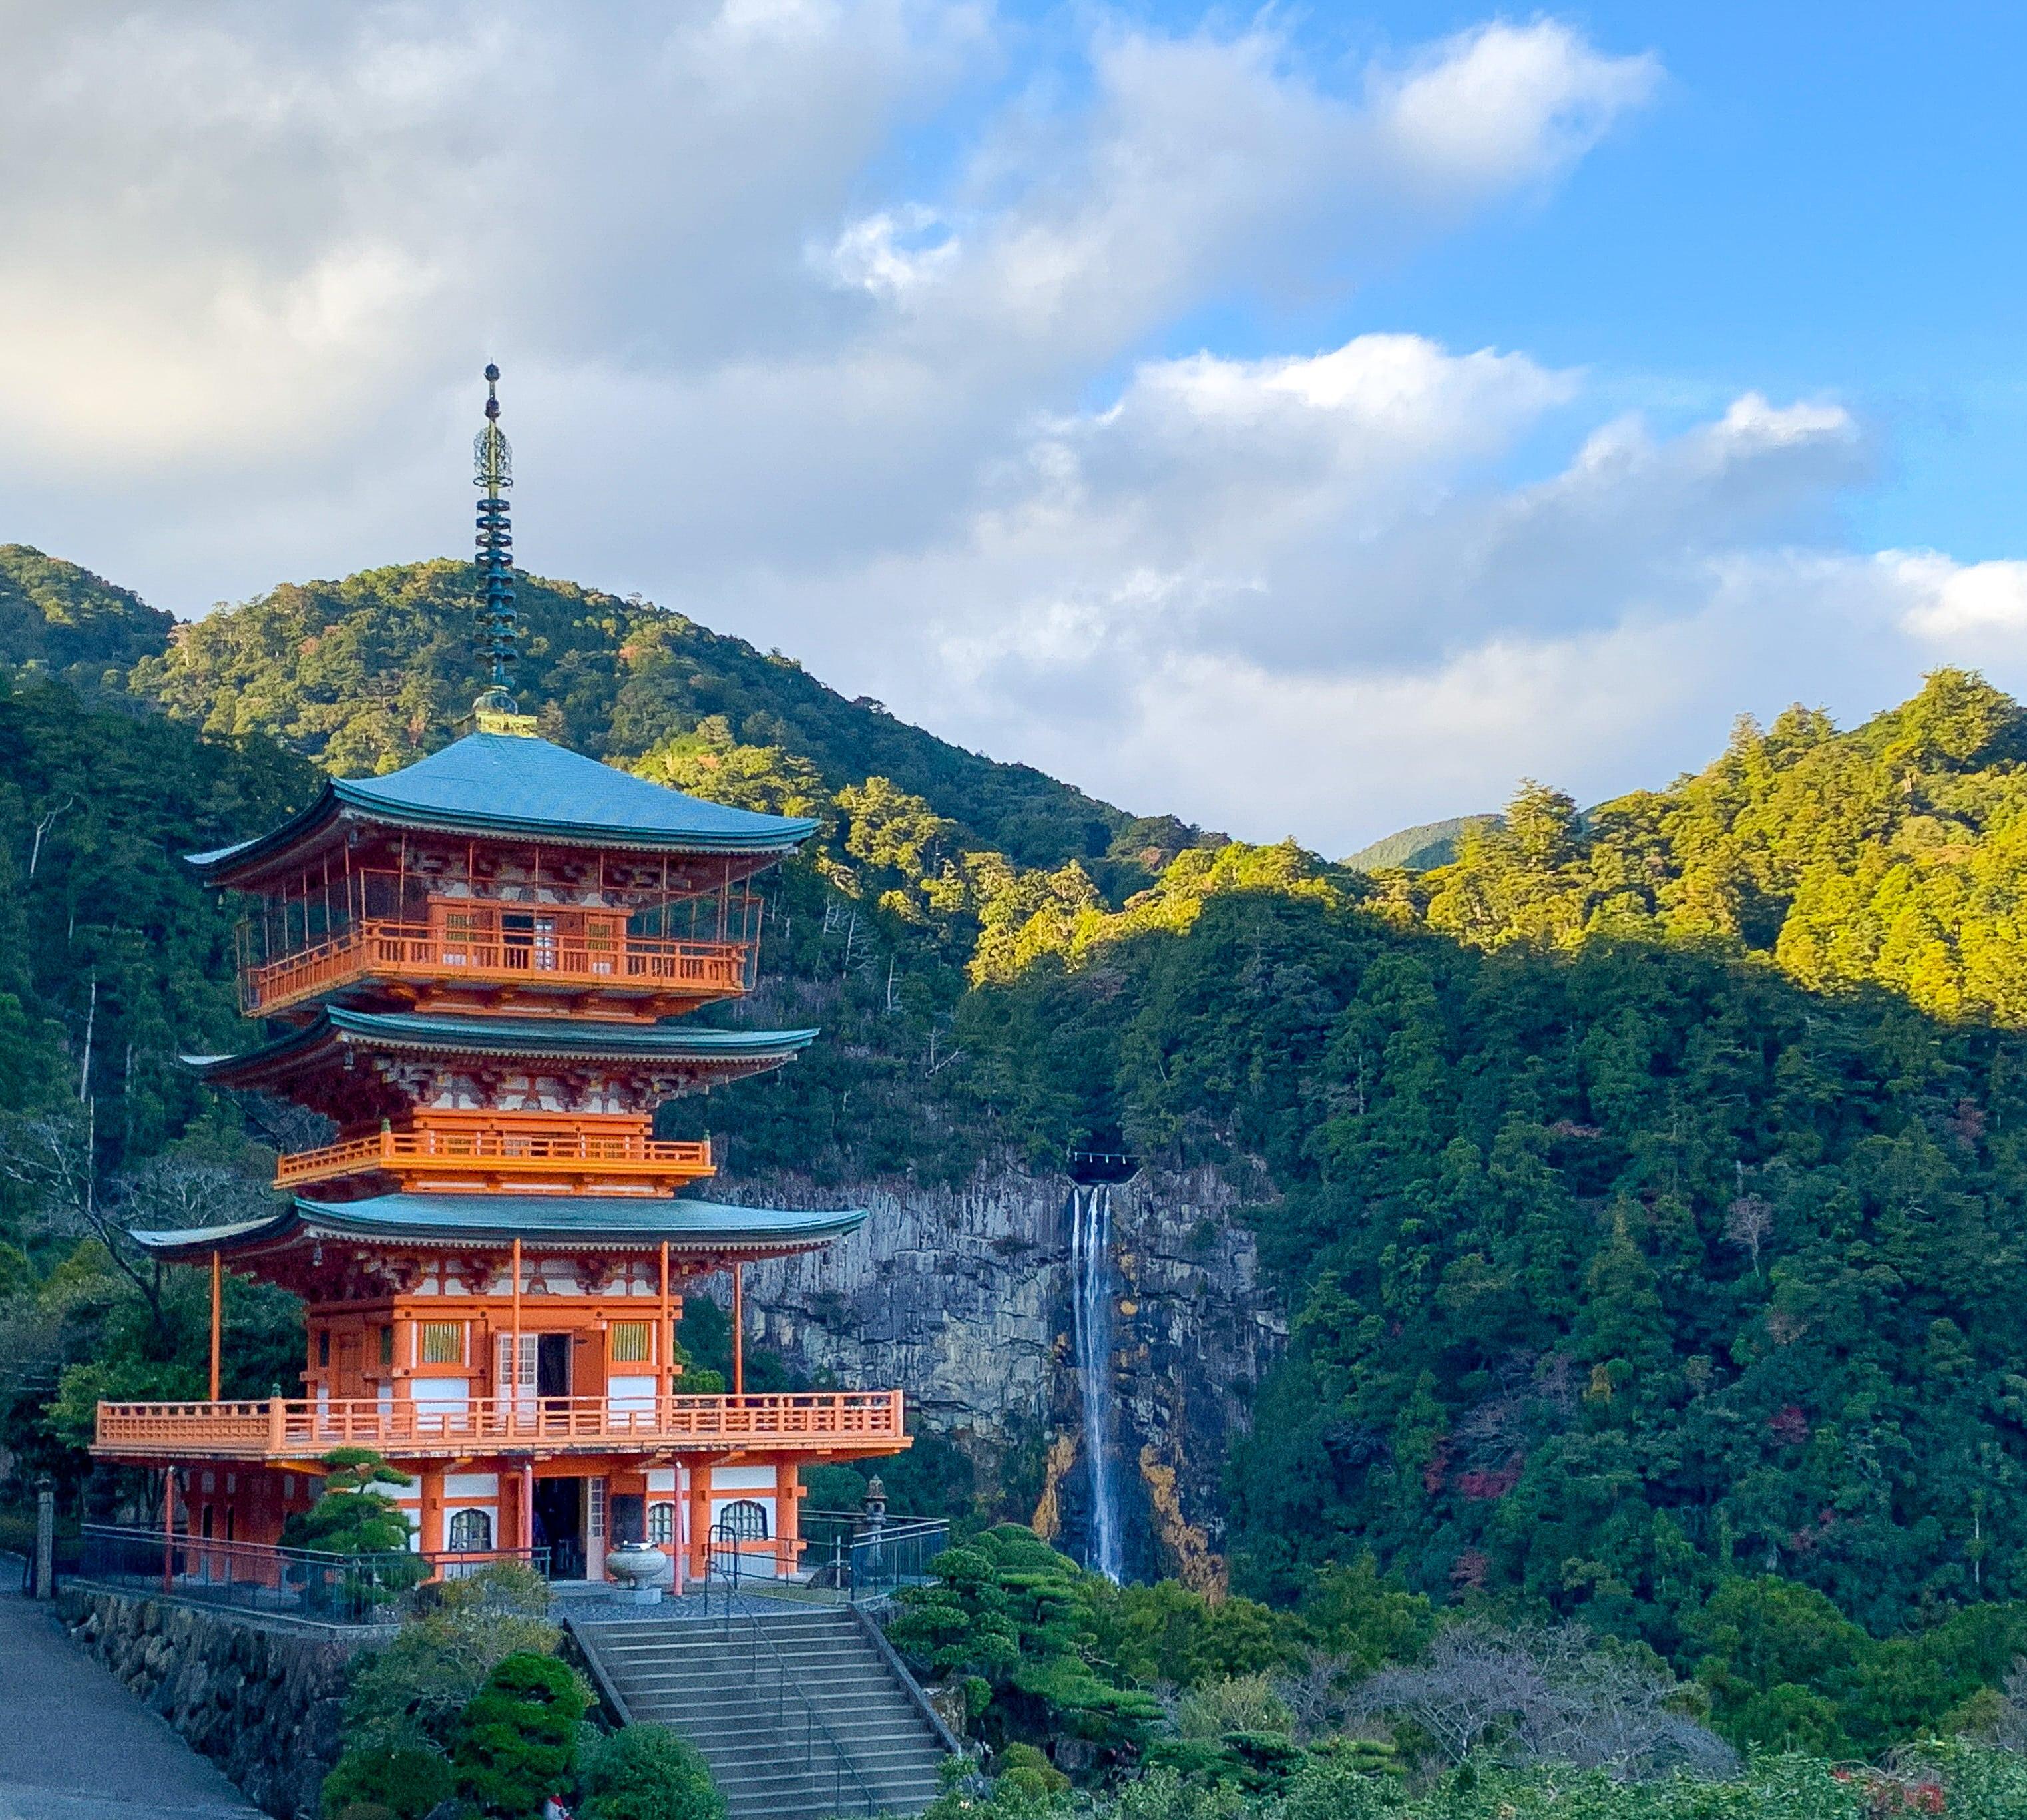 Naichi Taisha Pagoda